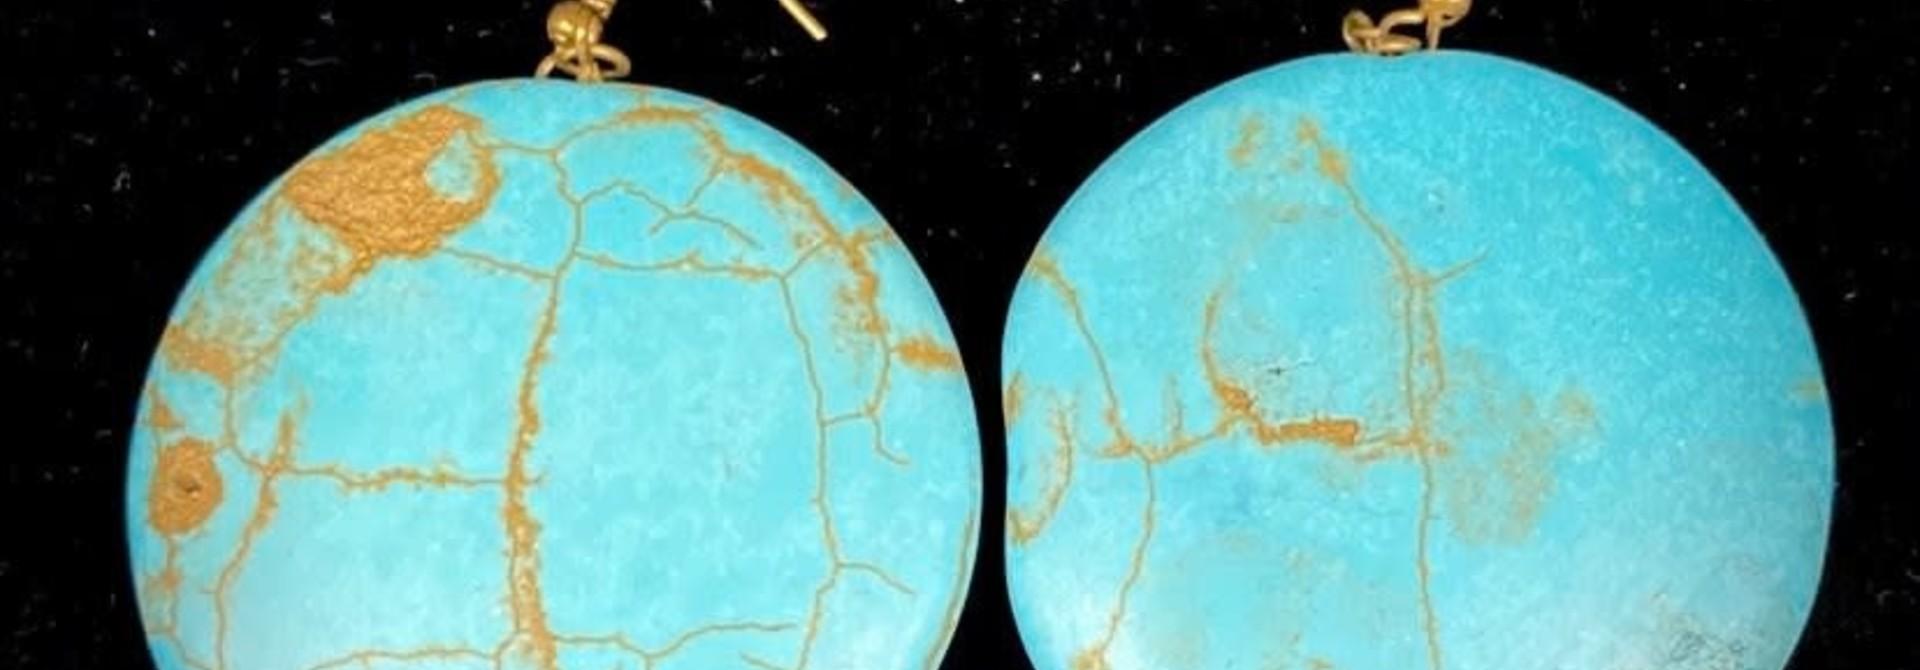 "1.75"" Solid Turquoise stone Earrings by Shawnee Renee"